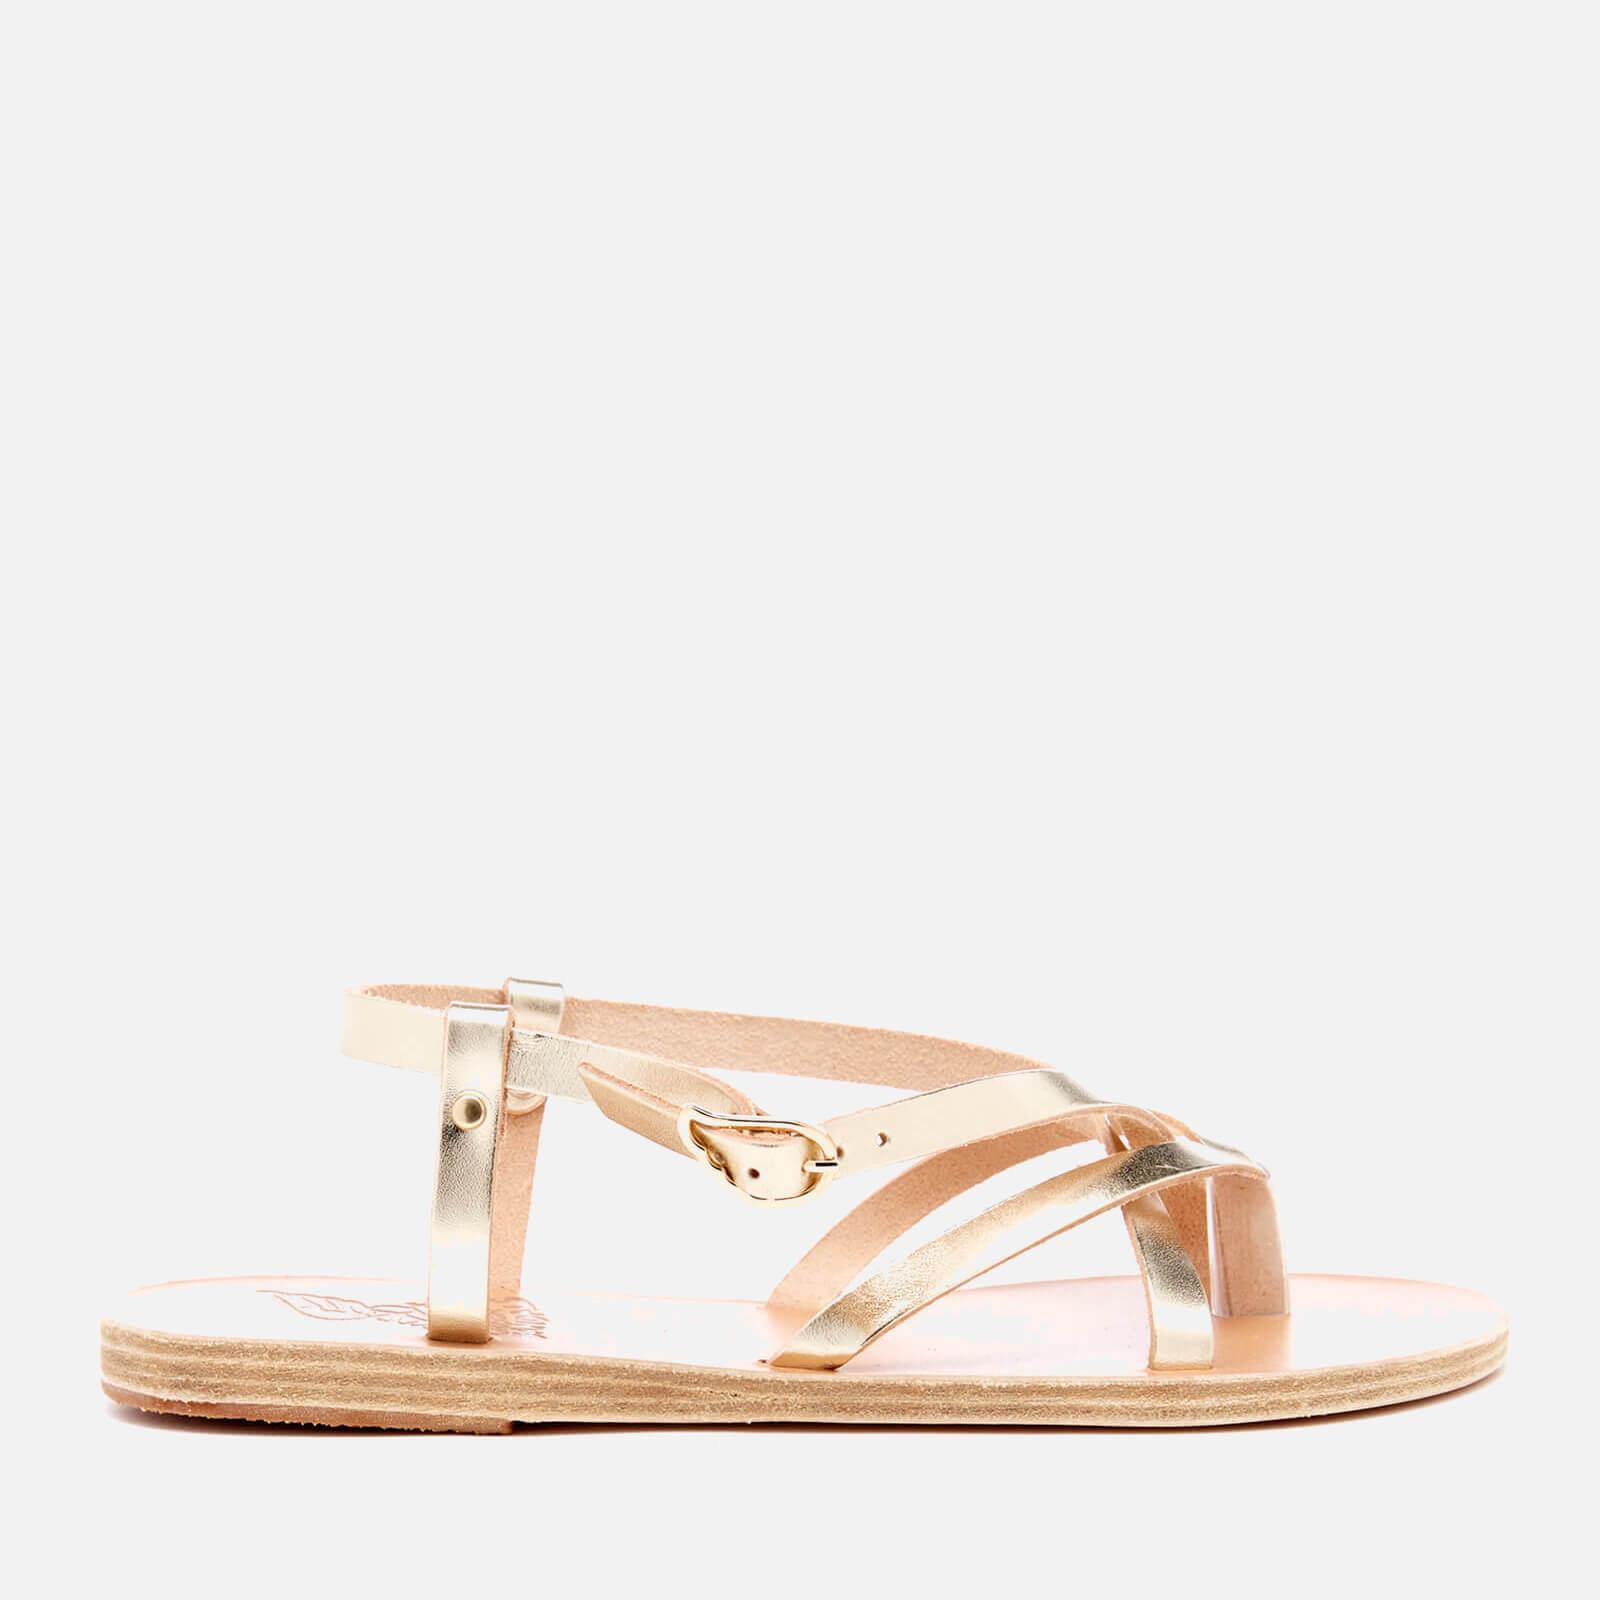 42c6b5135 Ancient Greek Sandals Women s Semele Multi Strap Flat Vachetta Leather  Sandals - Platinum - Free UK Delivery over £50